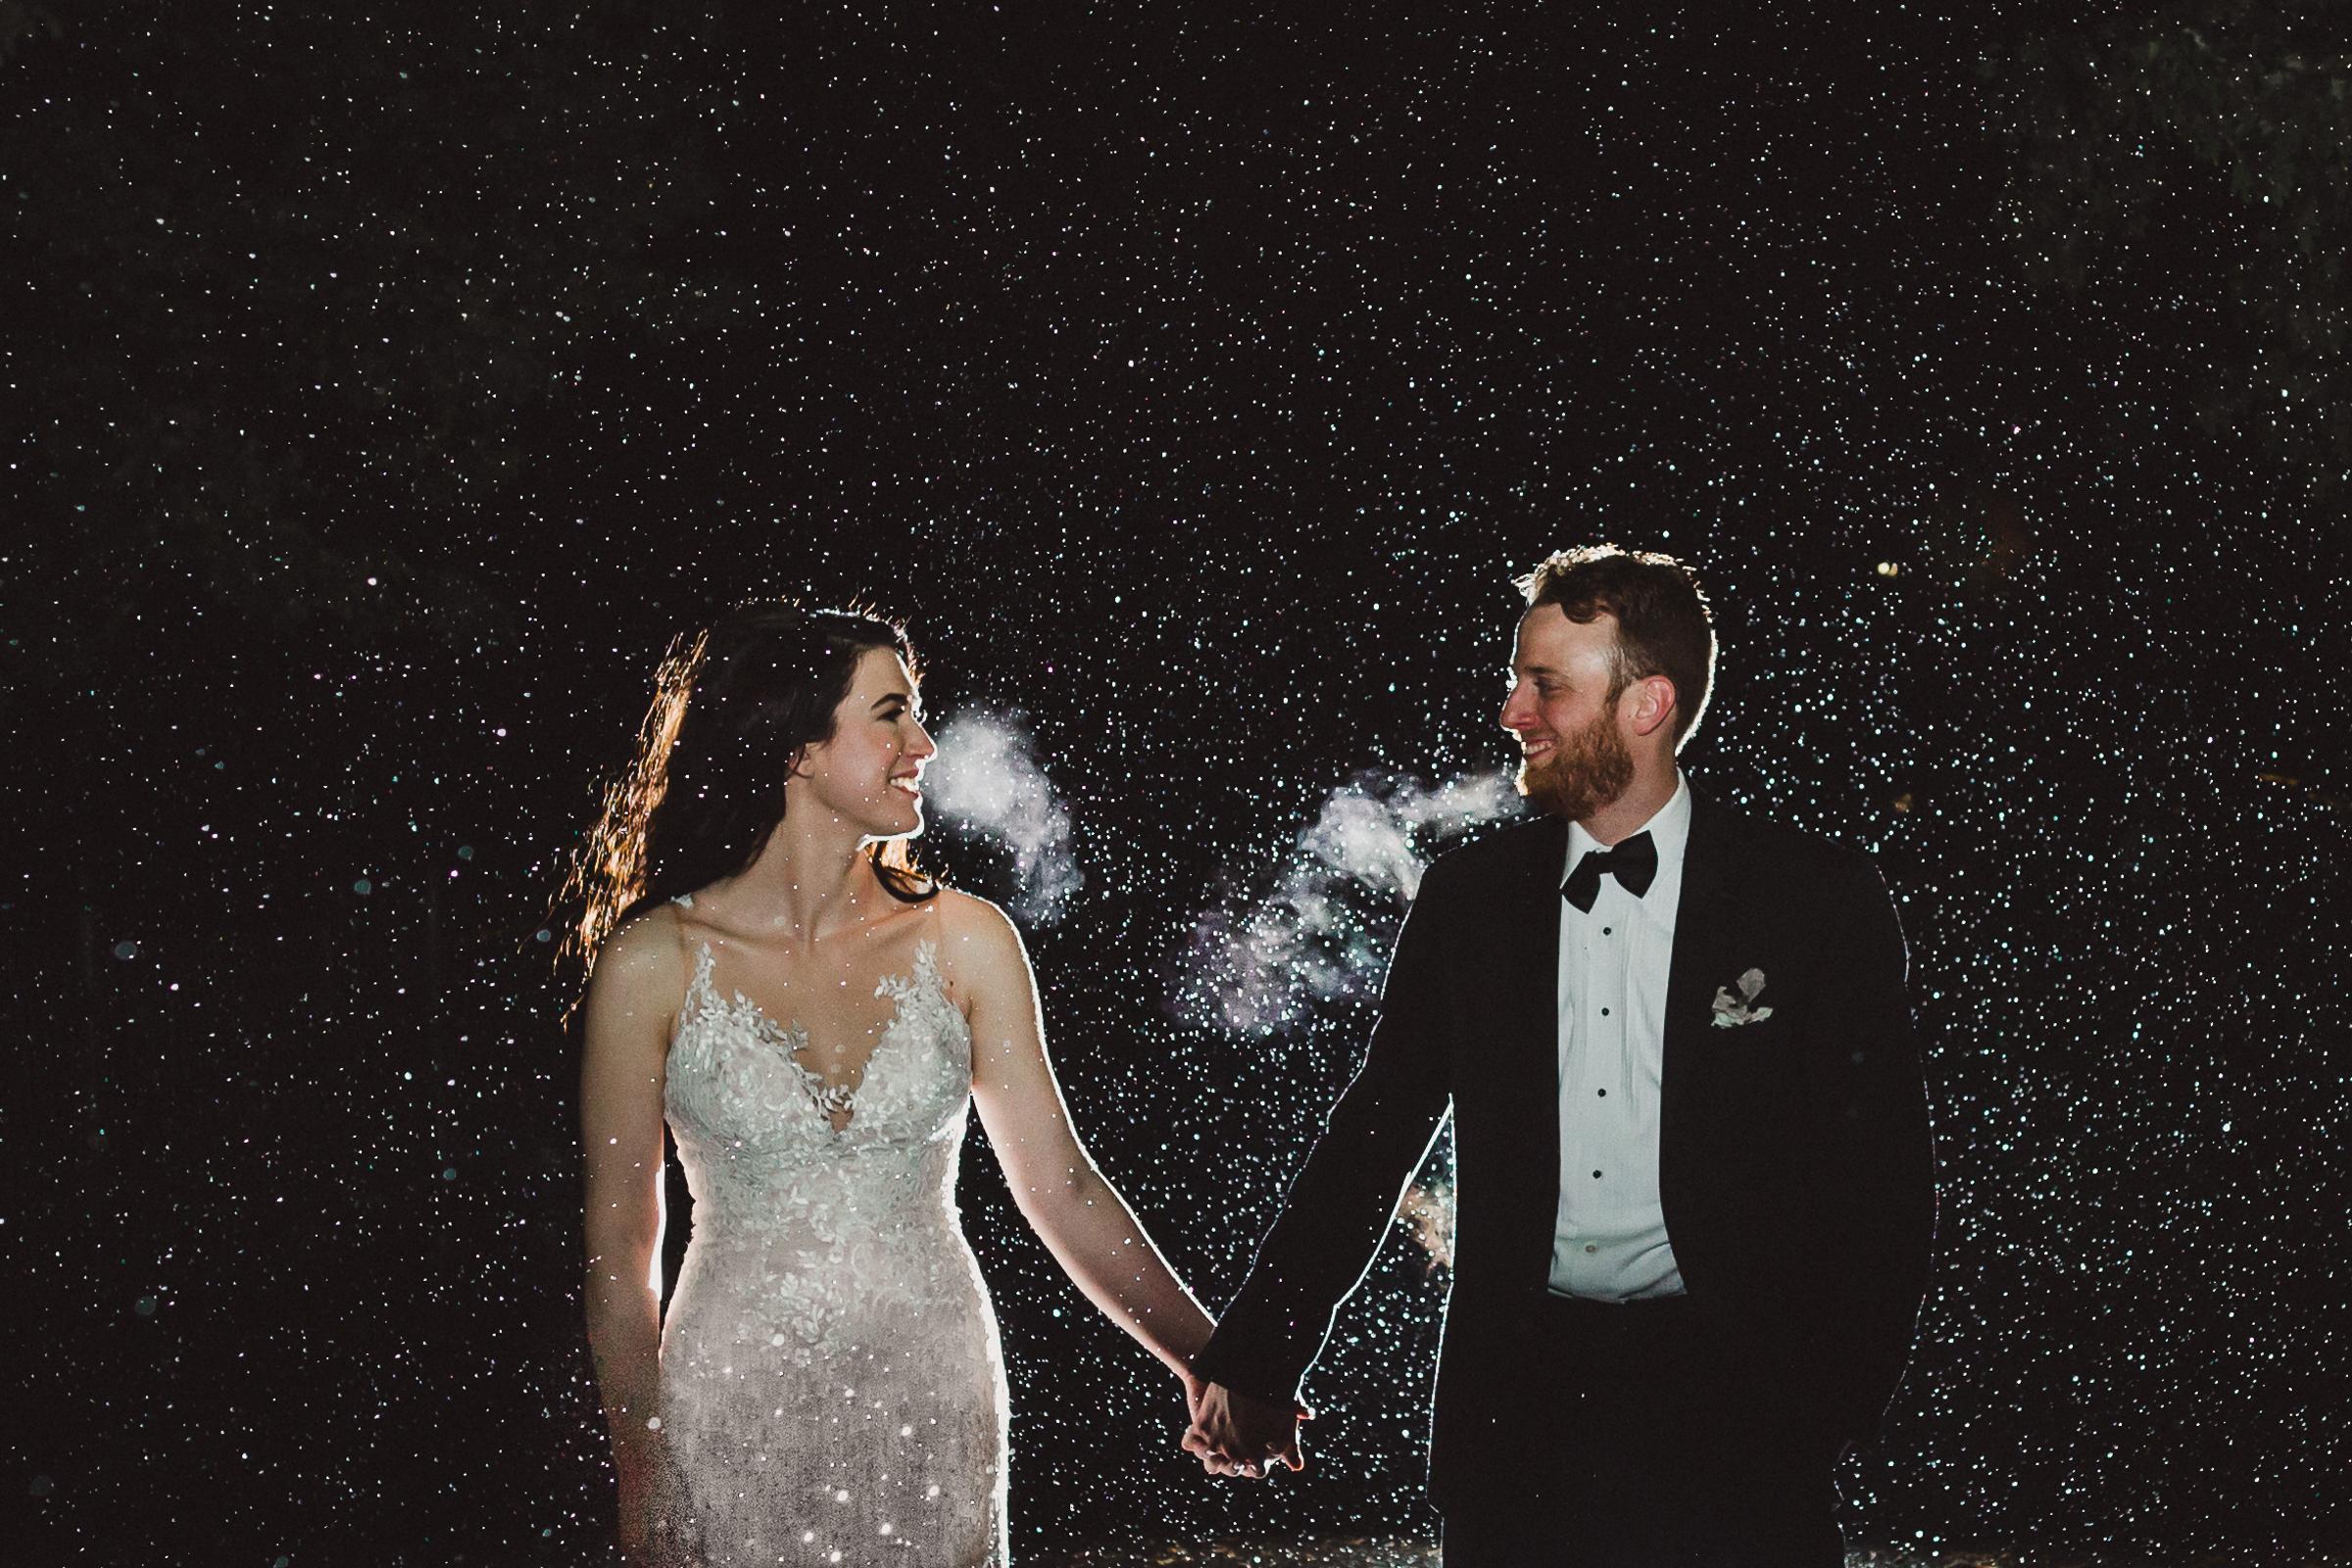 New-York-Documentary-Wedding-Photography-Best-Of-2017-by-Elvira-Kalviste-Photography-65.jpg